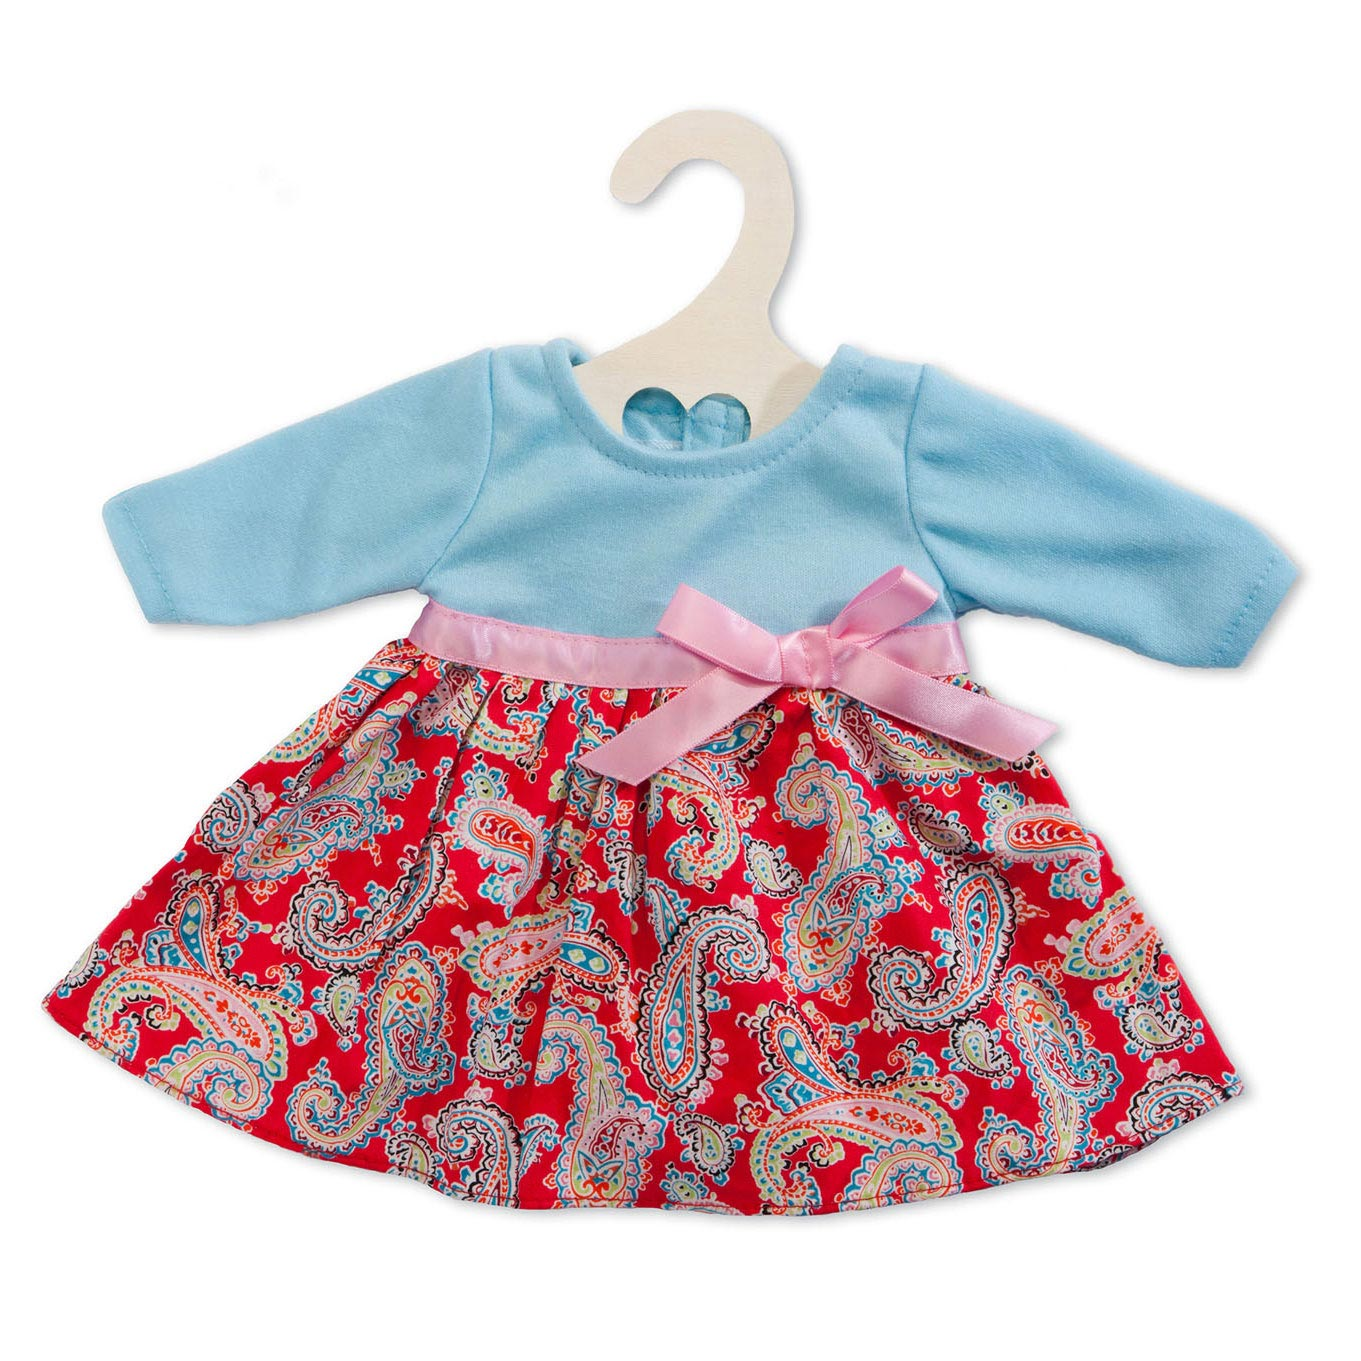 79b6f32327 Játékbaba ruha, 28 - 35 cm